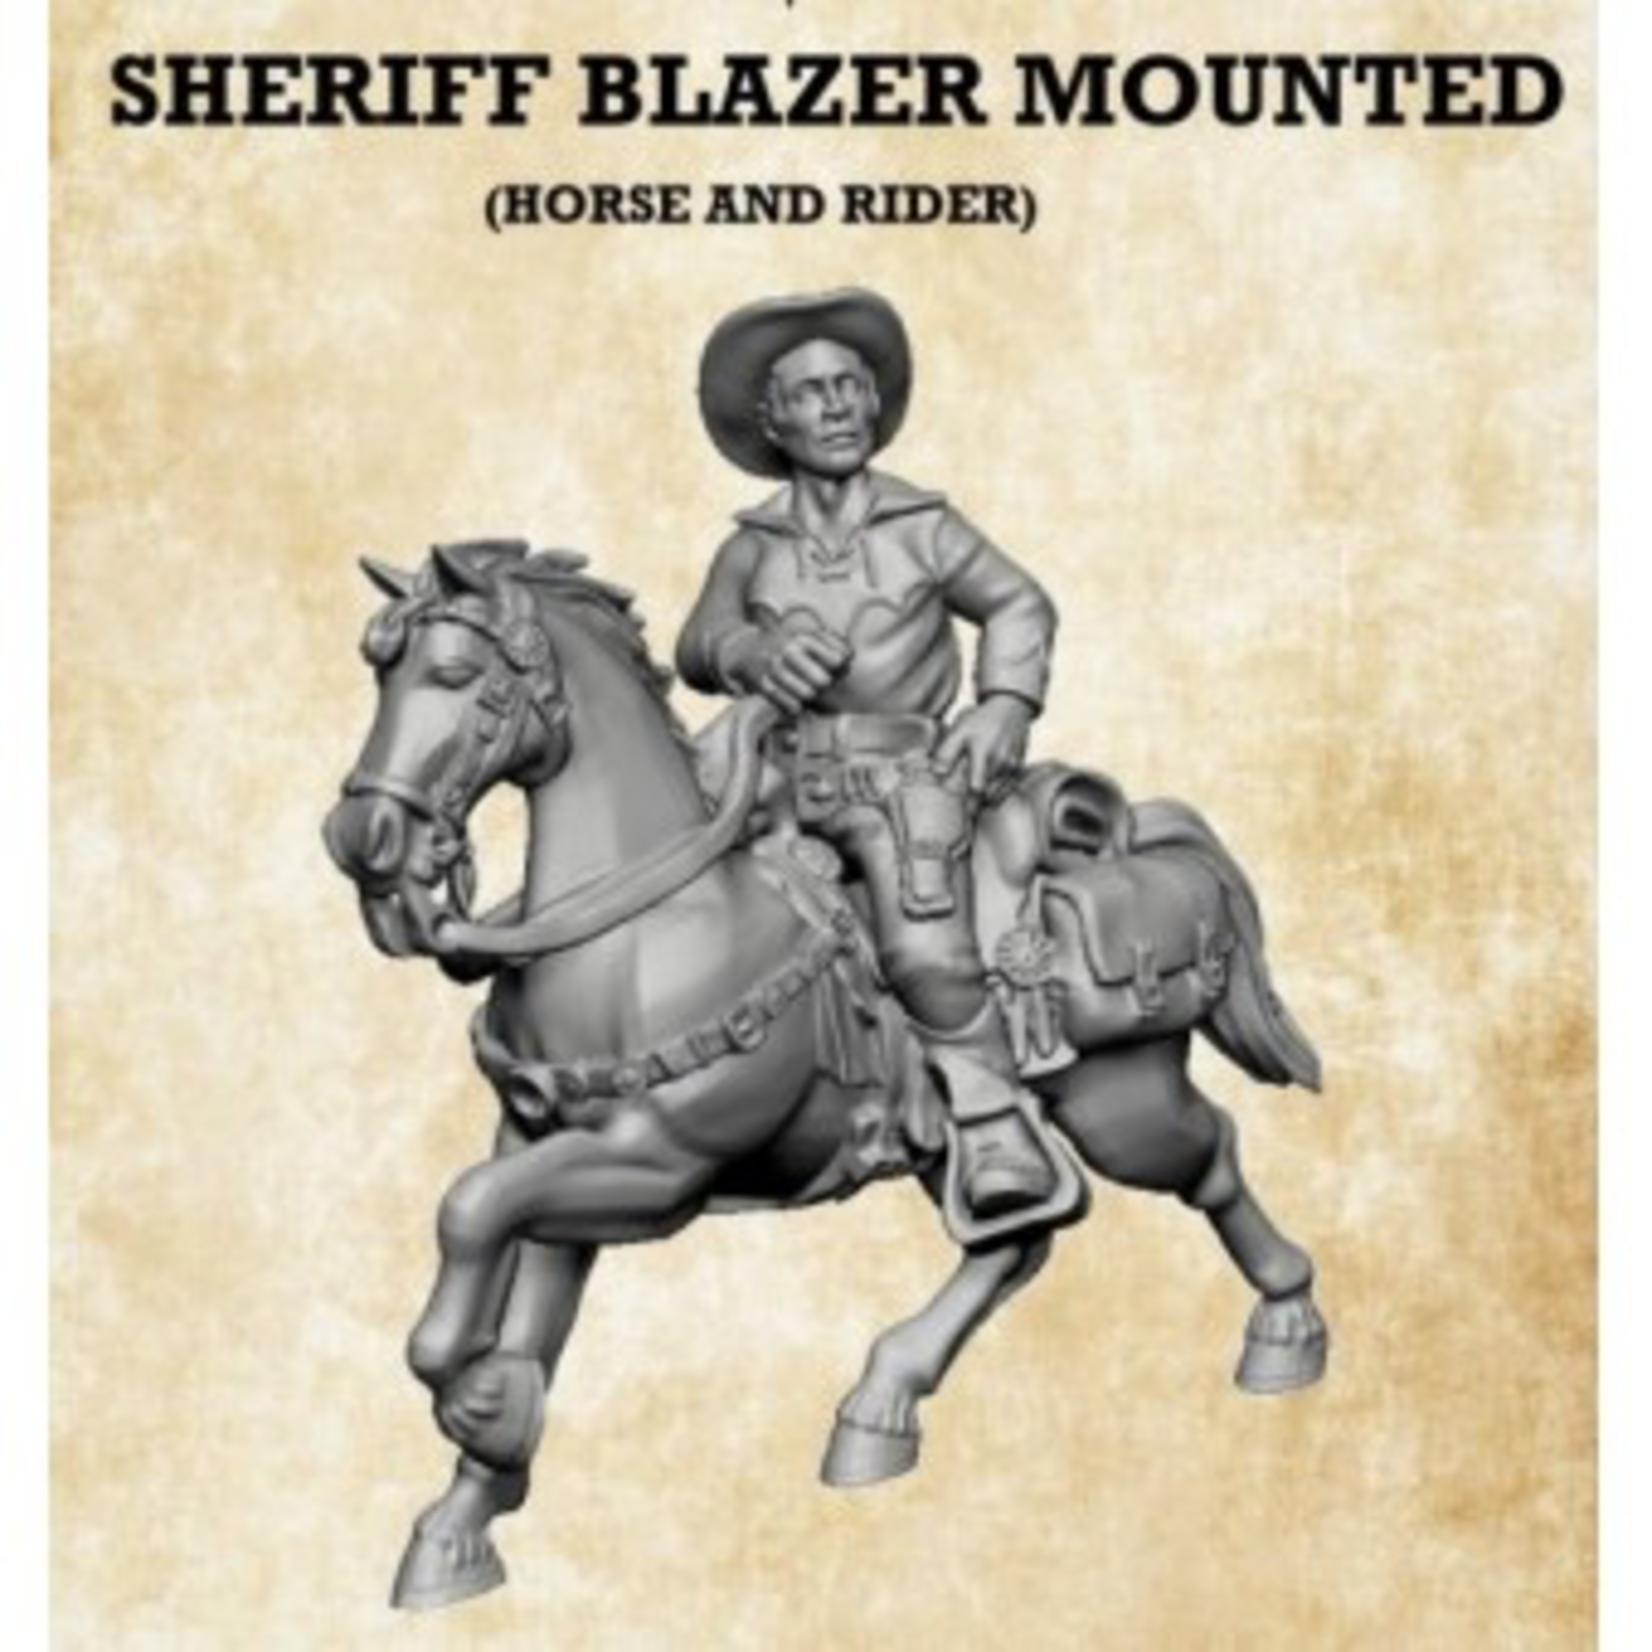 Sheriff Blazer Mounted